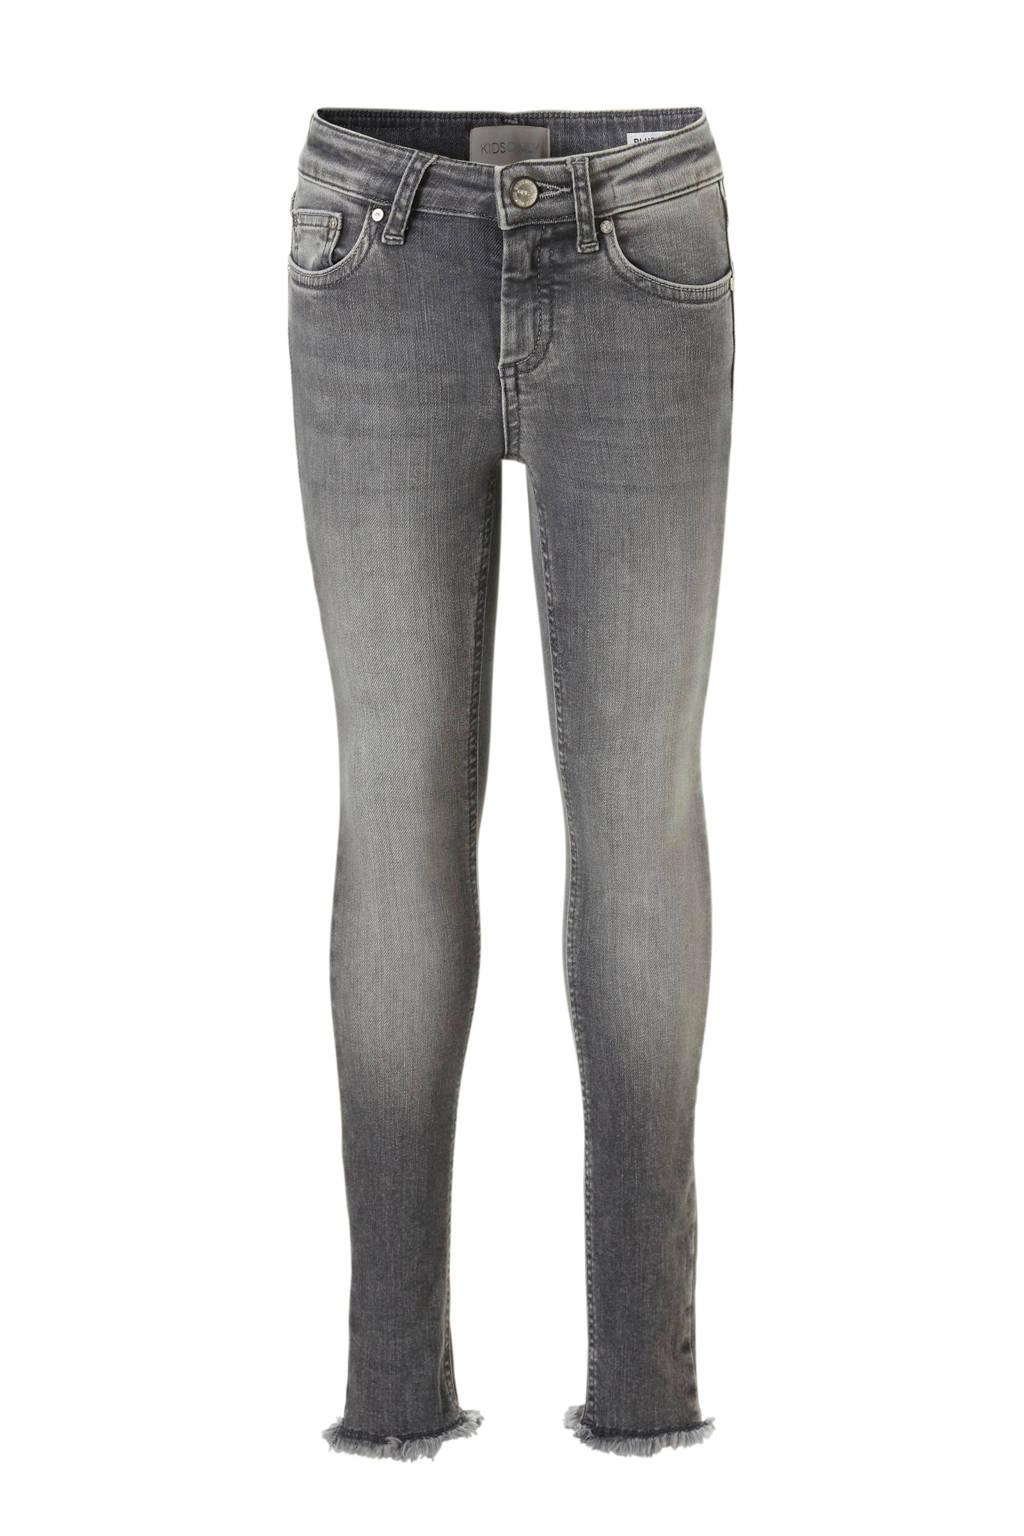 KIDSONLY skinny fit jeans Blush, Grijs